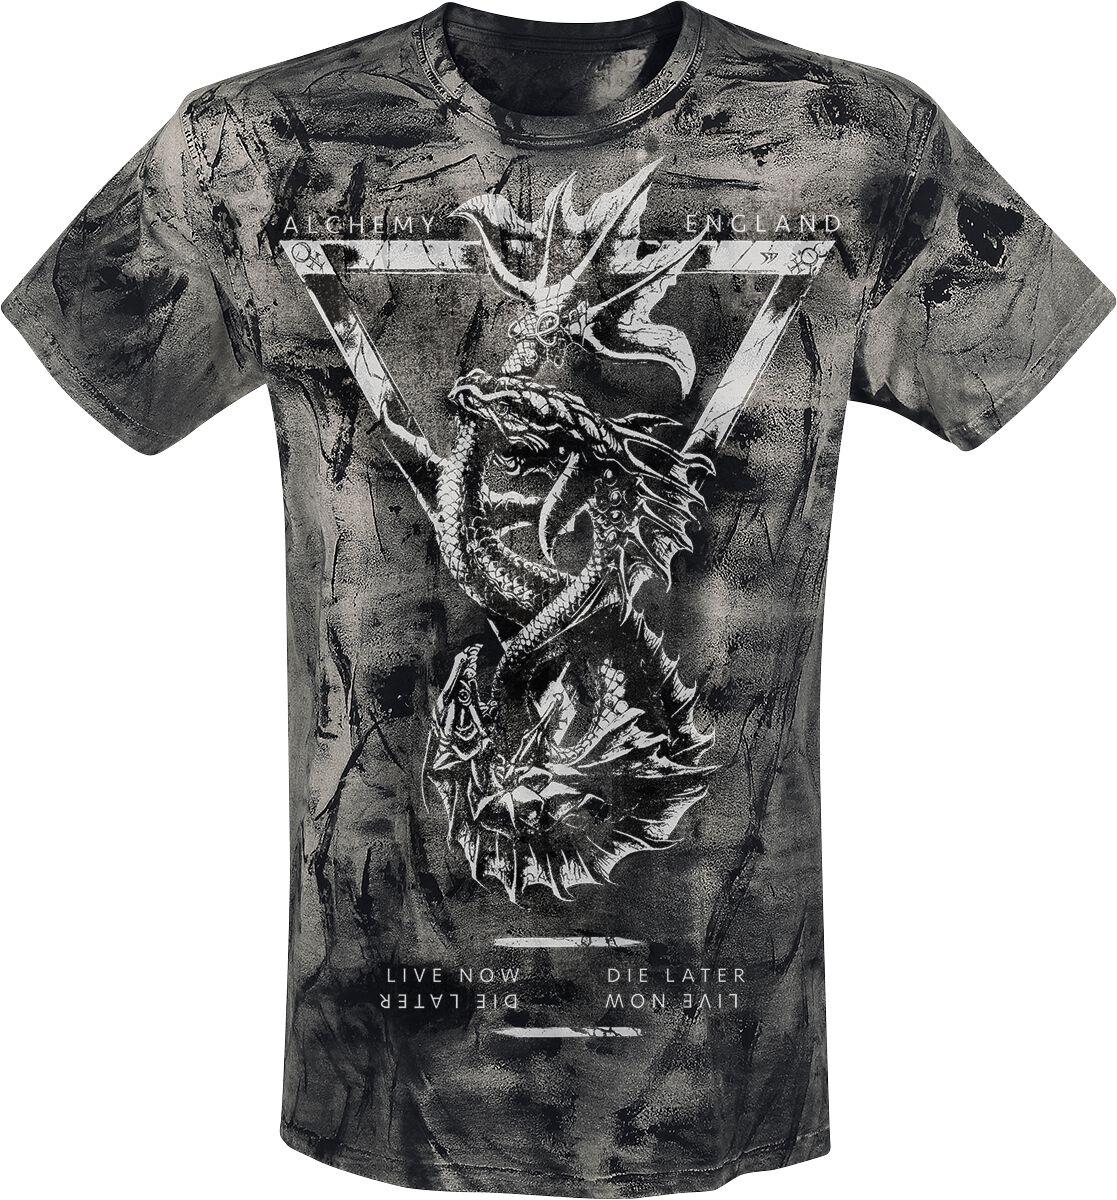 Image of   Alchemy England Pisces T-Shirt grå